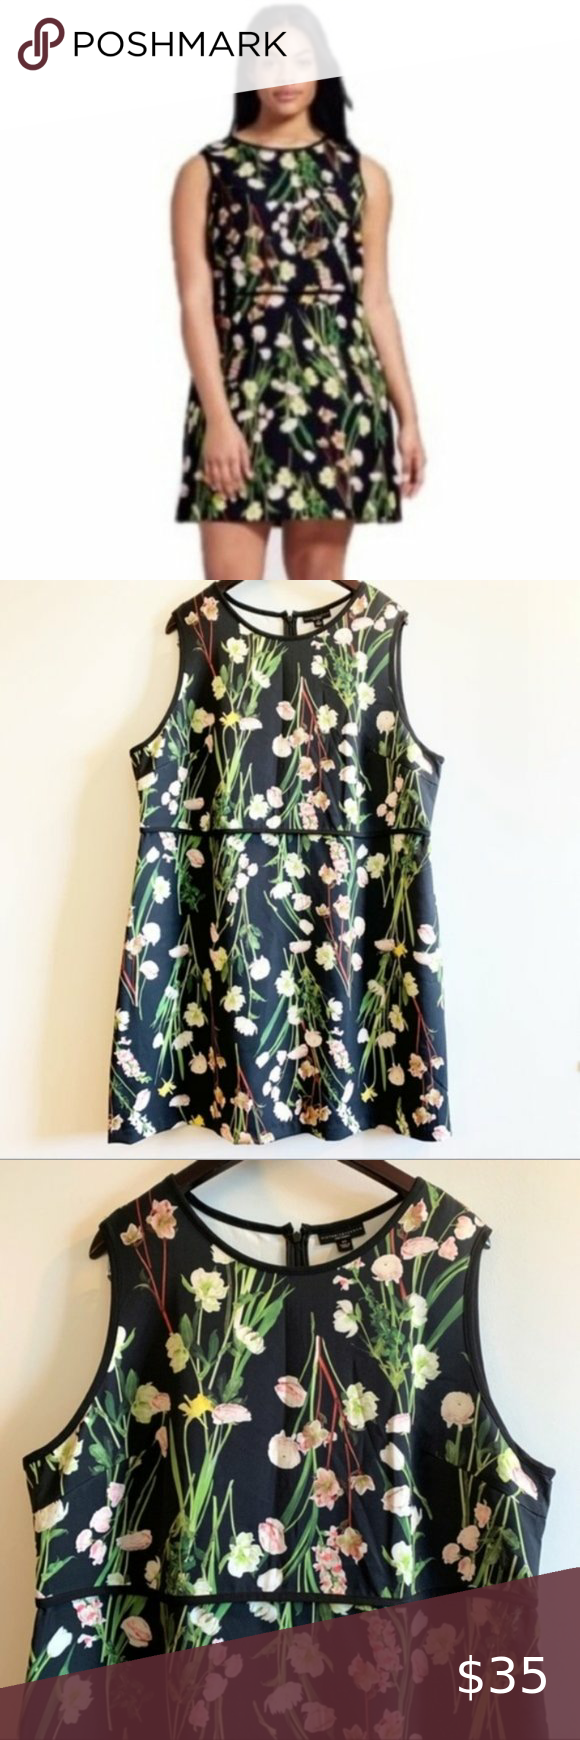 Victoria Beckham For Target Black Floral Dress 2x Size 2x Measurements Approx Bust 26 Waist 23 L Floral Dress Black Victoria Beckham Target Dresses 2x [ 1740 x 580 Pixel ]